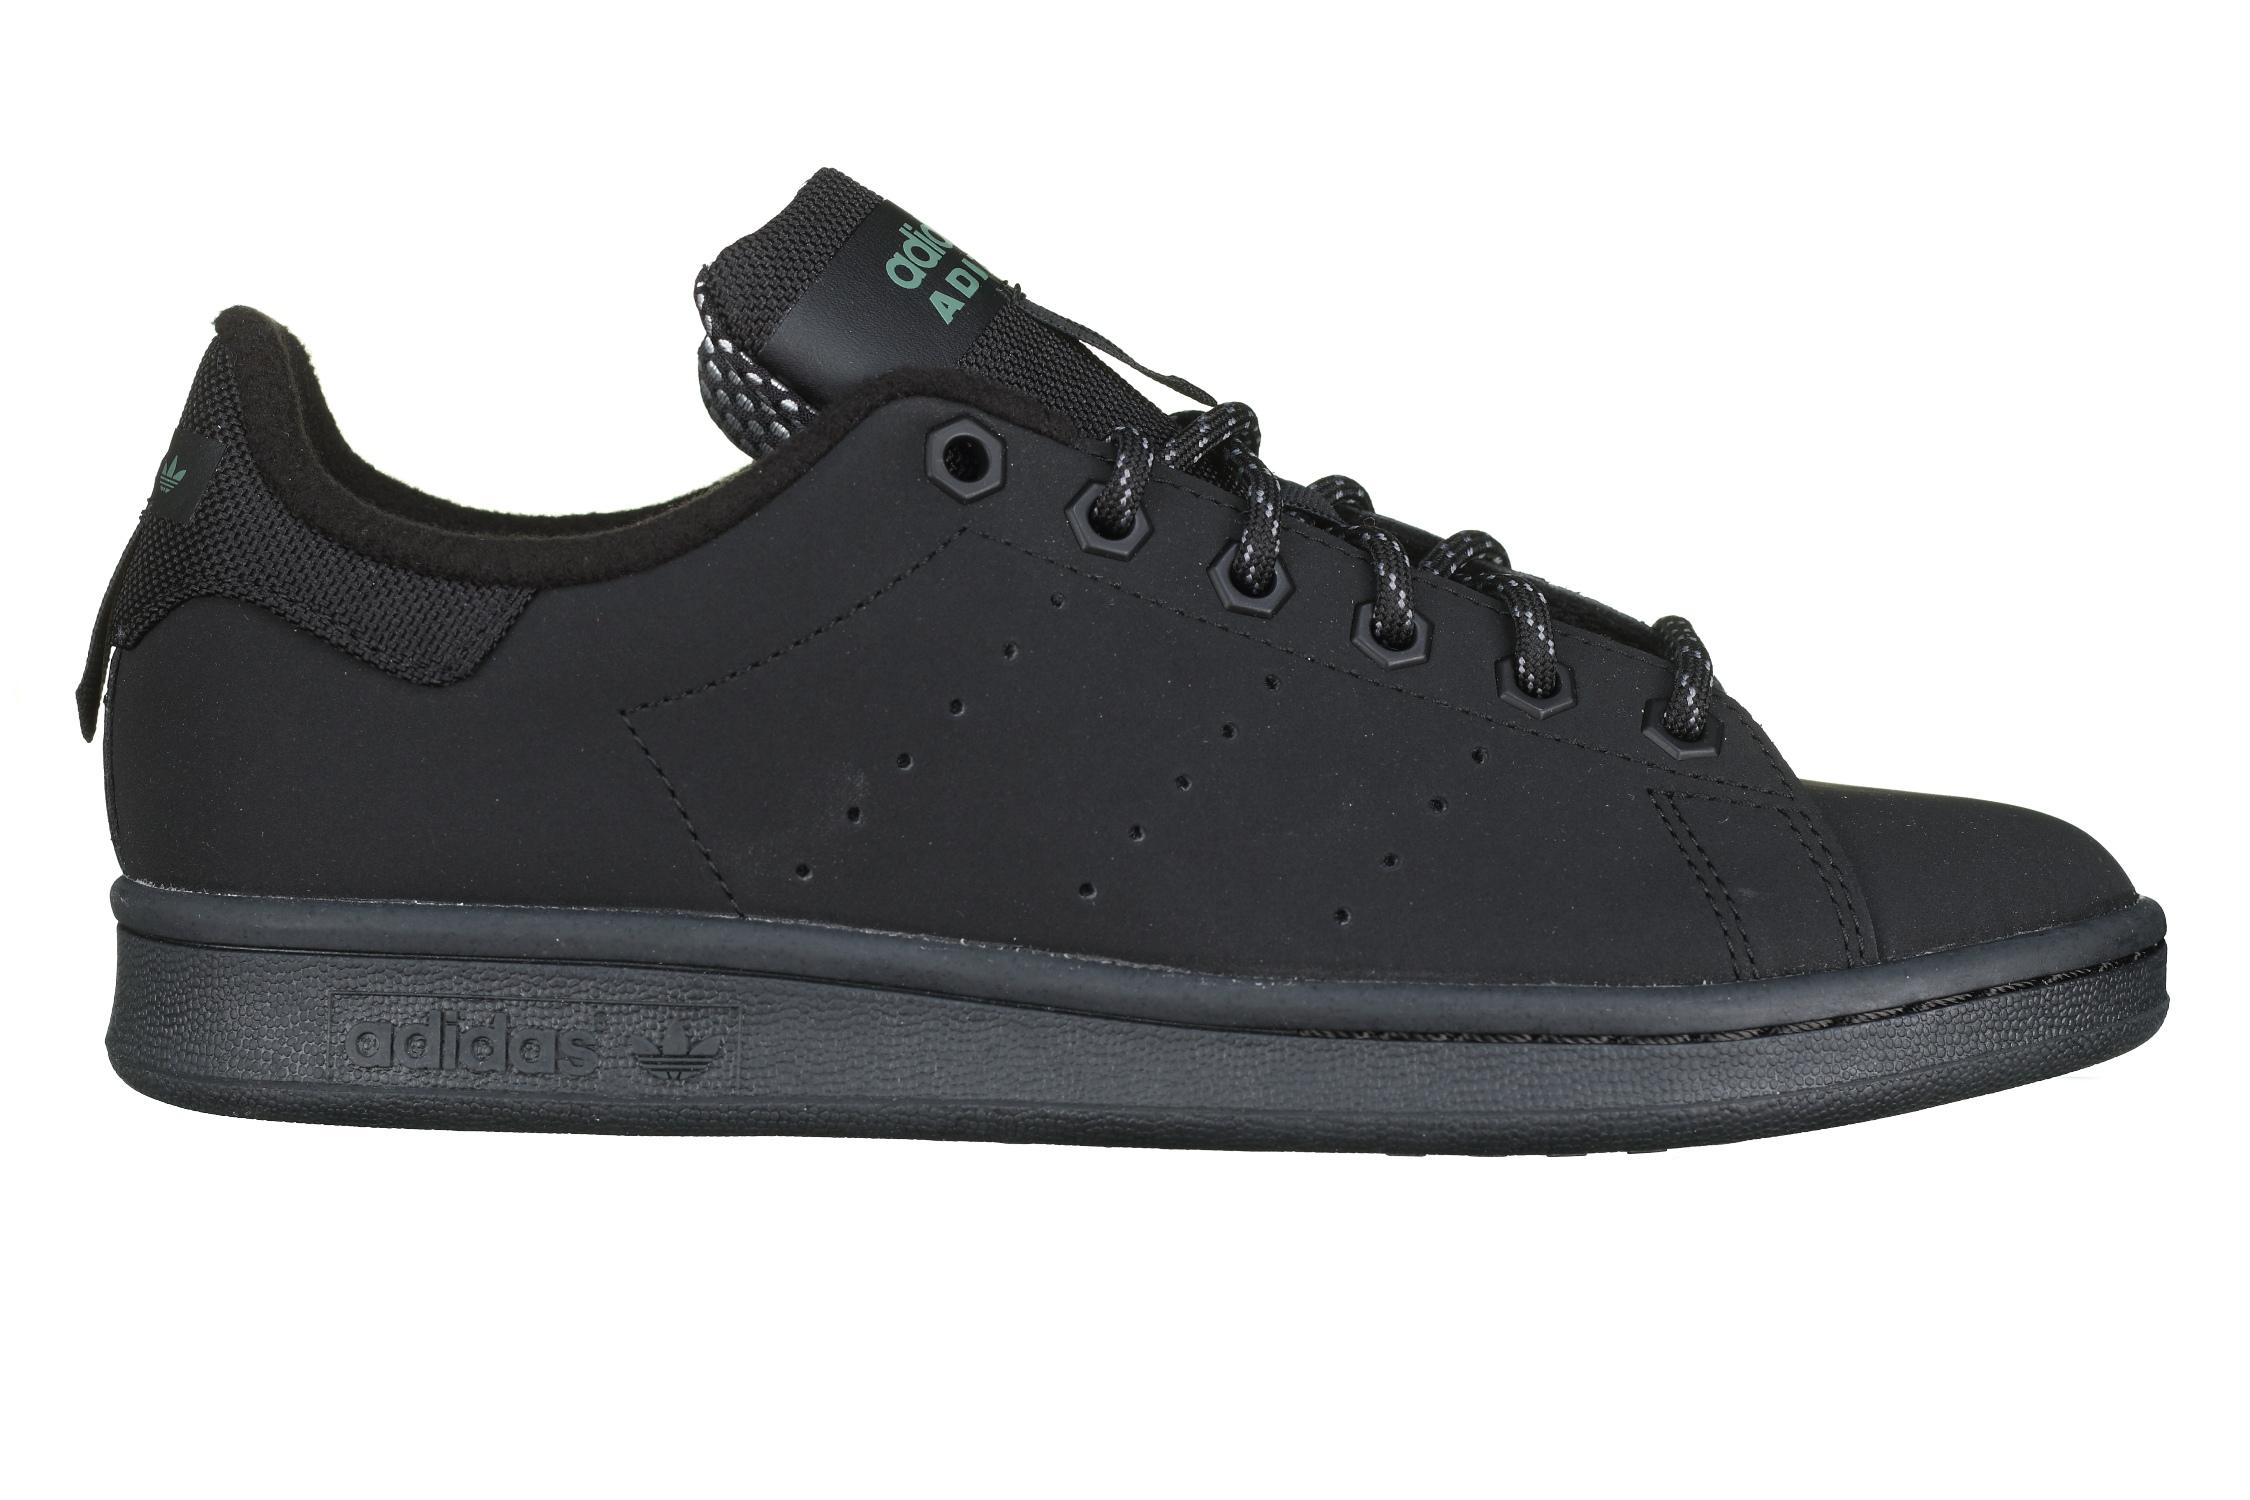 http://www.leadermode.com/184037/adidas-stan-smith-fv4641-noir.jpg